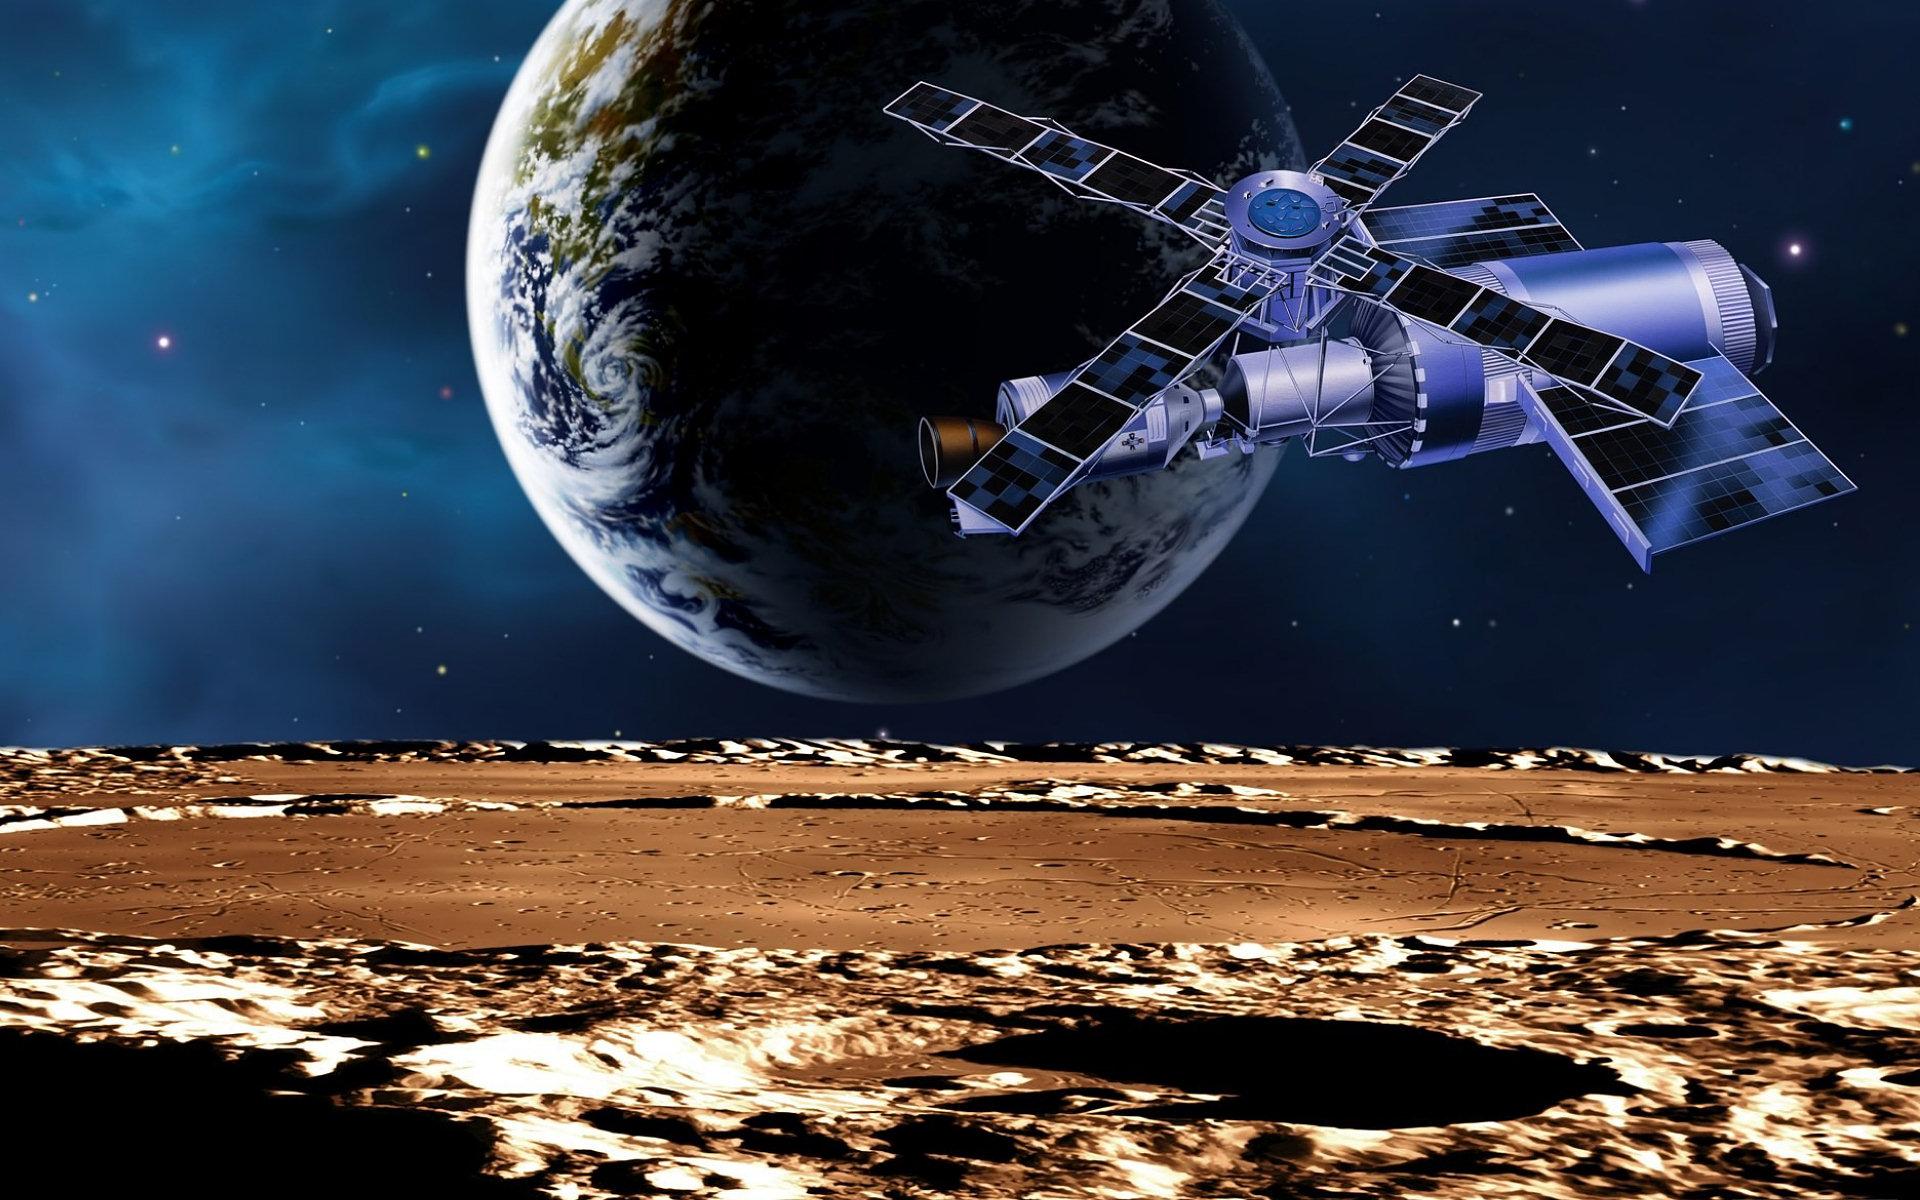 space exploration satellites - photo #37